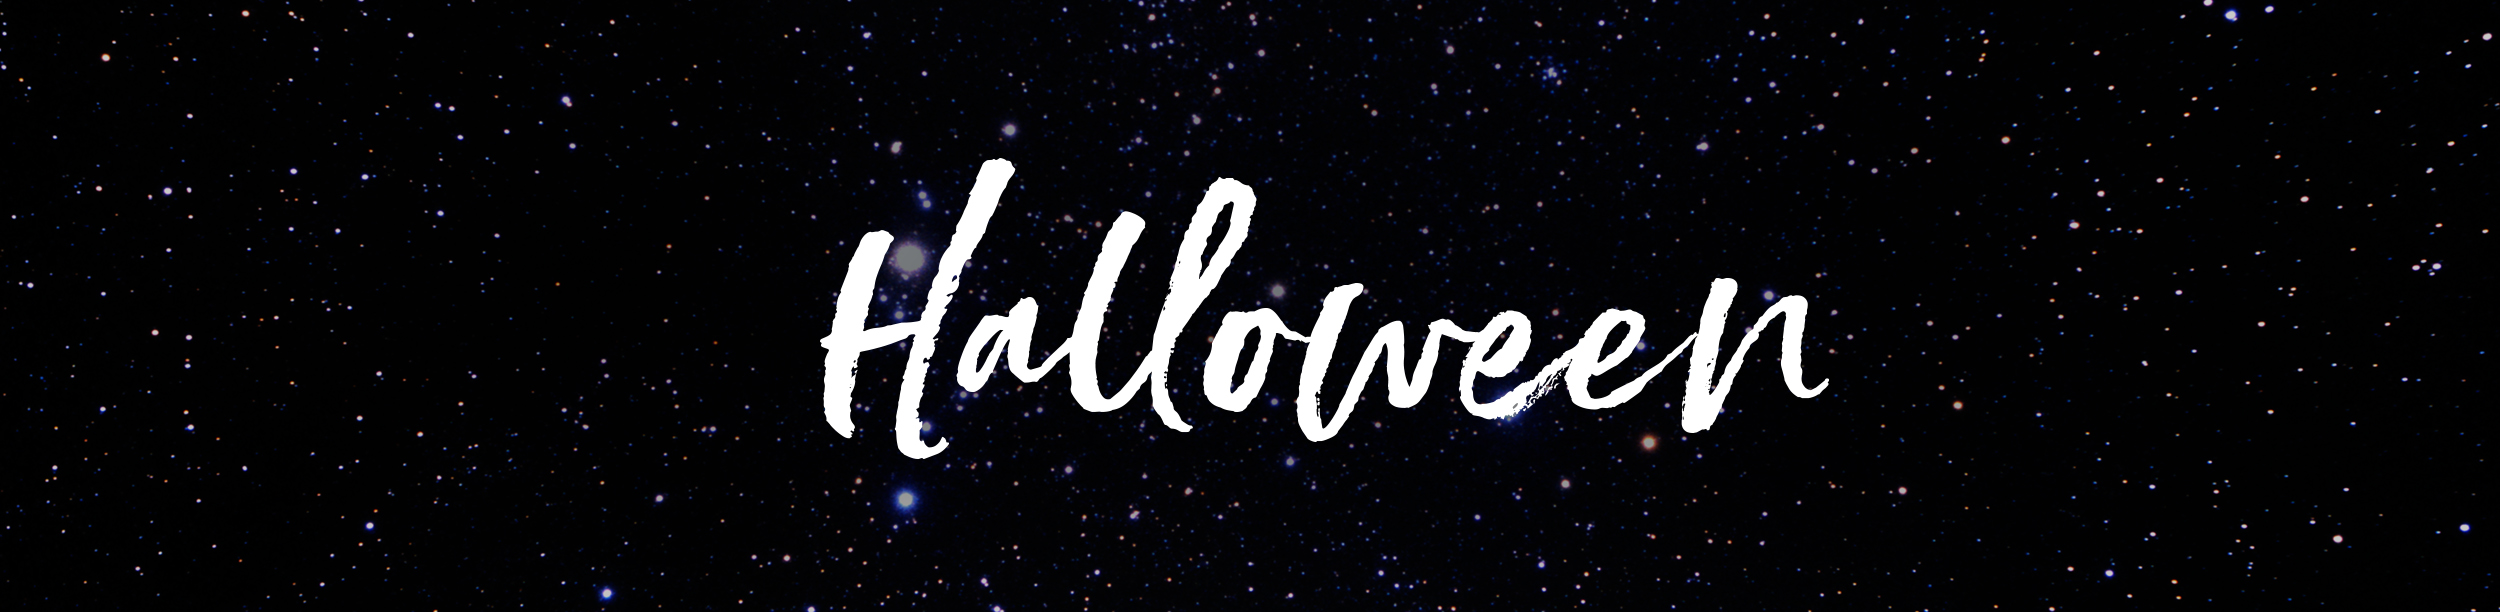 banner_halloween2.jpg